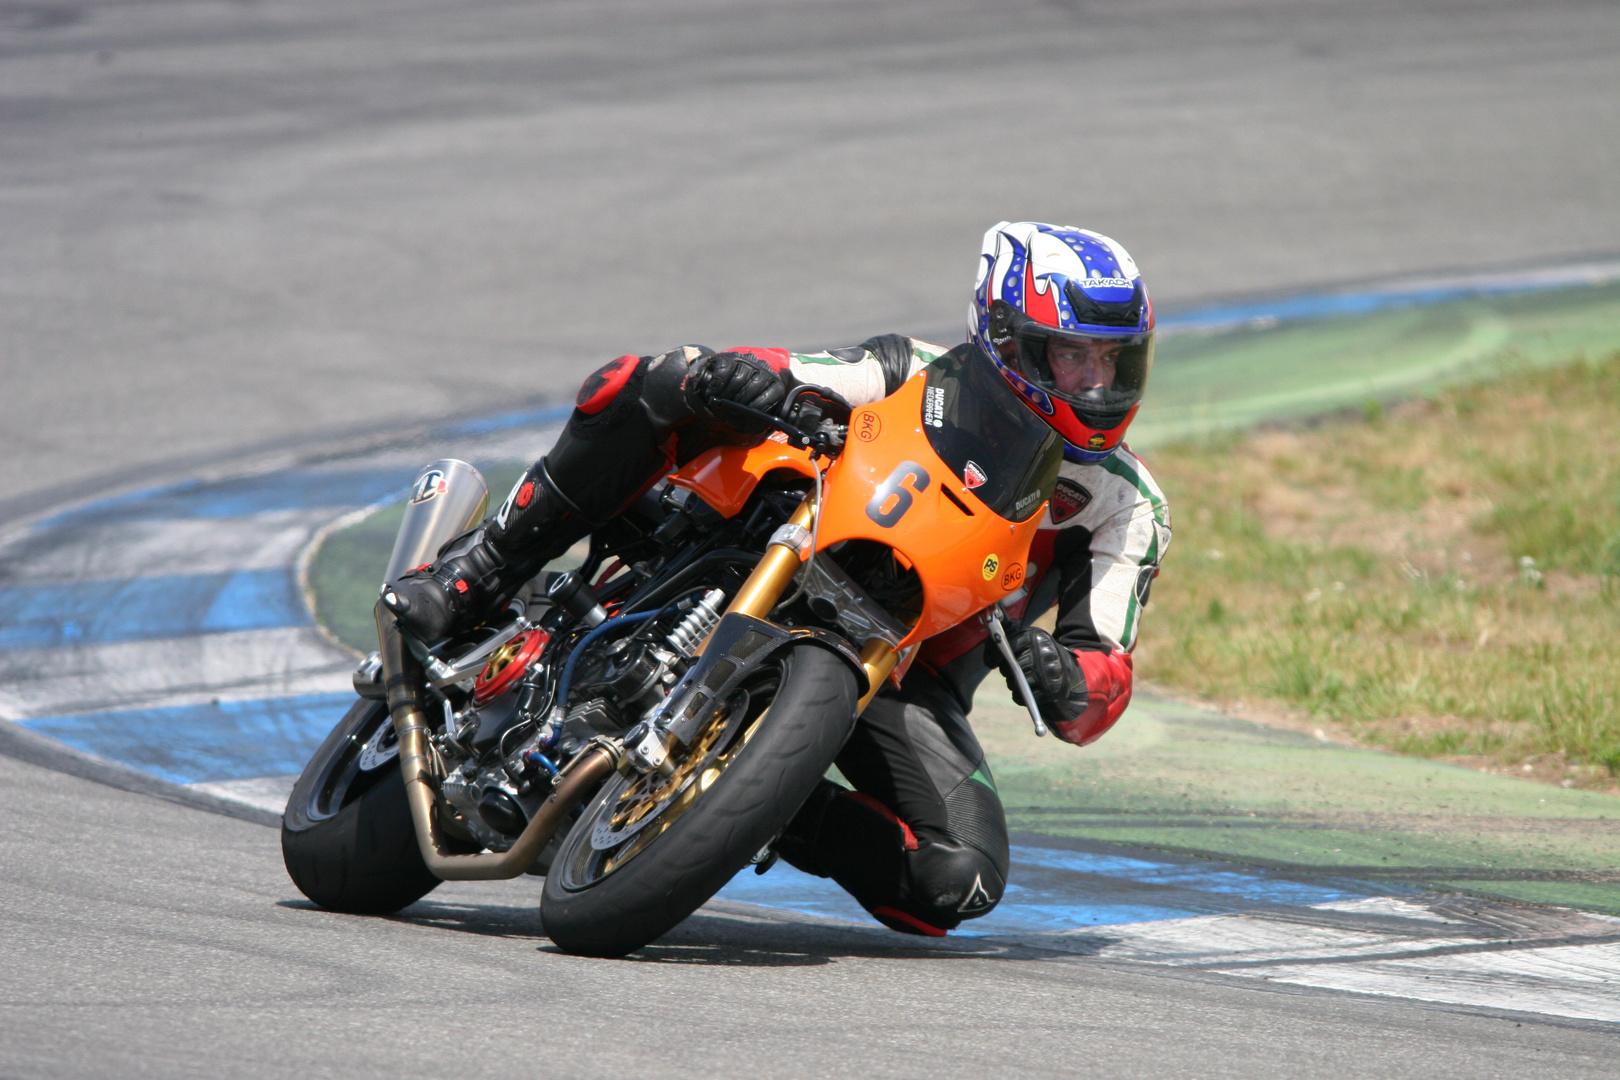 Ducati im Einsatz